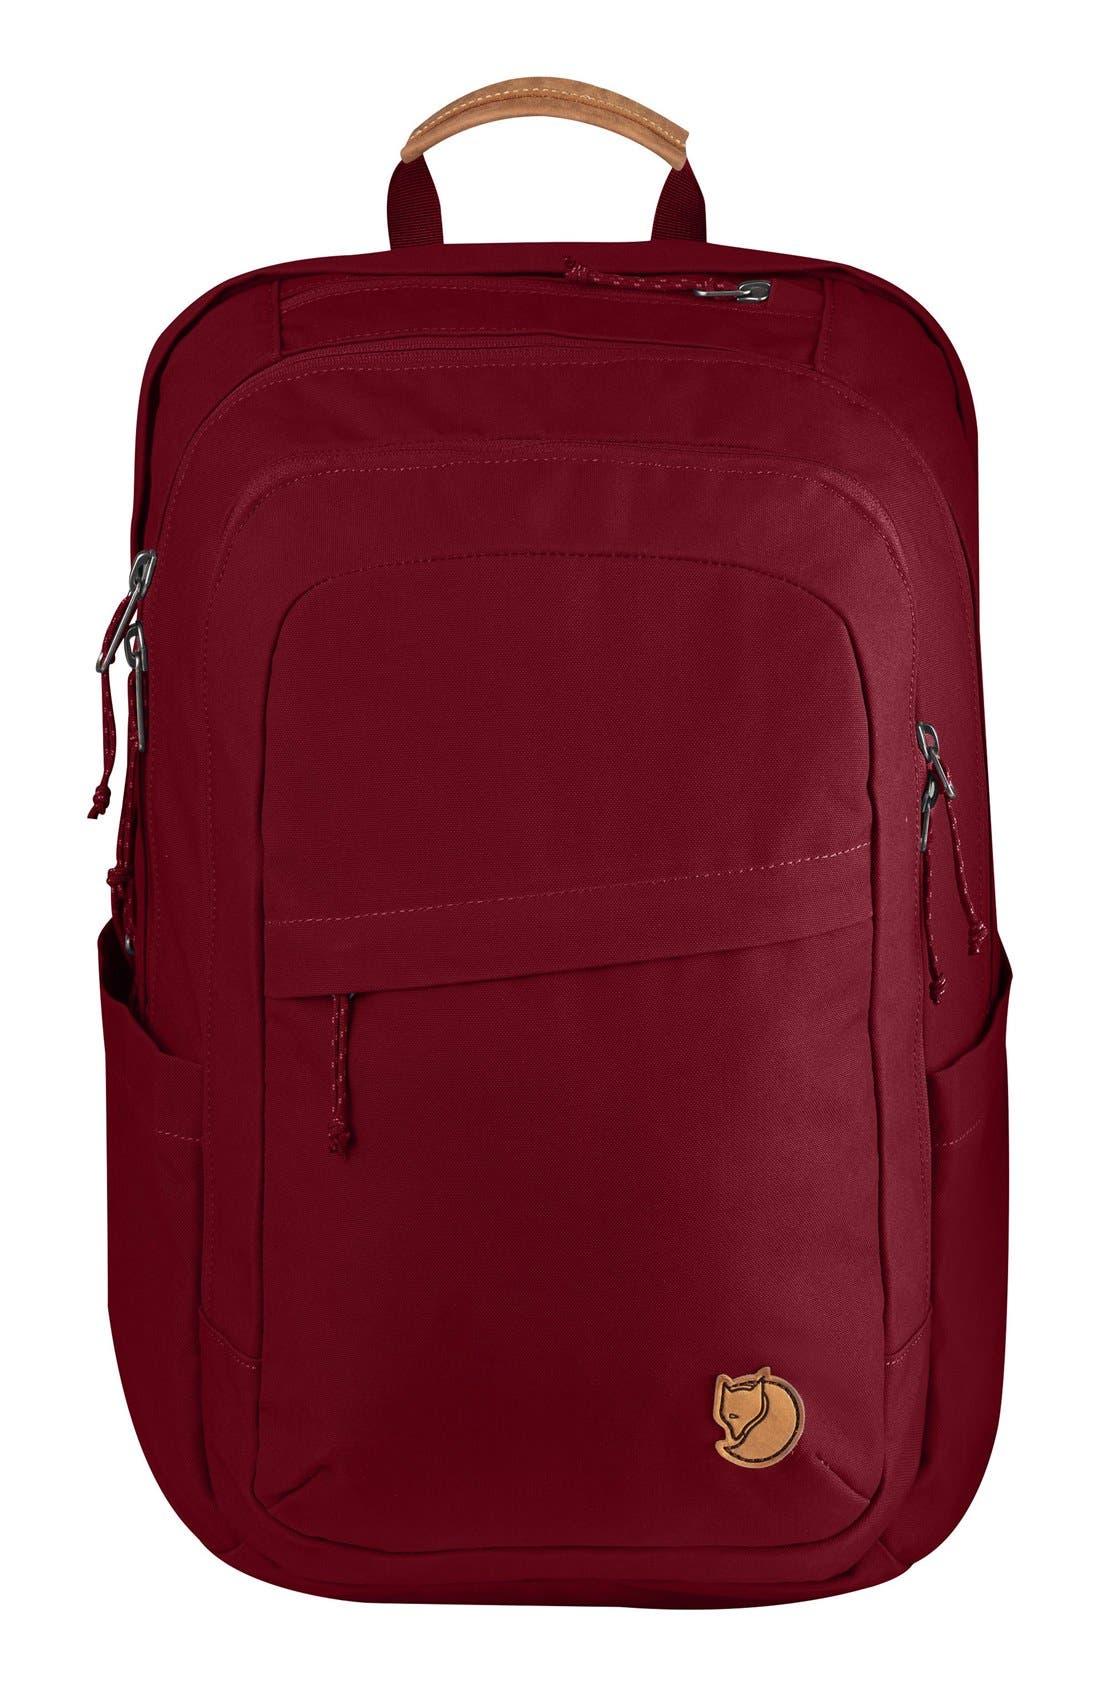 FJÄLLRÄVEN Raven 28L Backpack